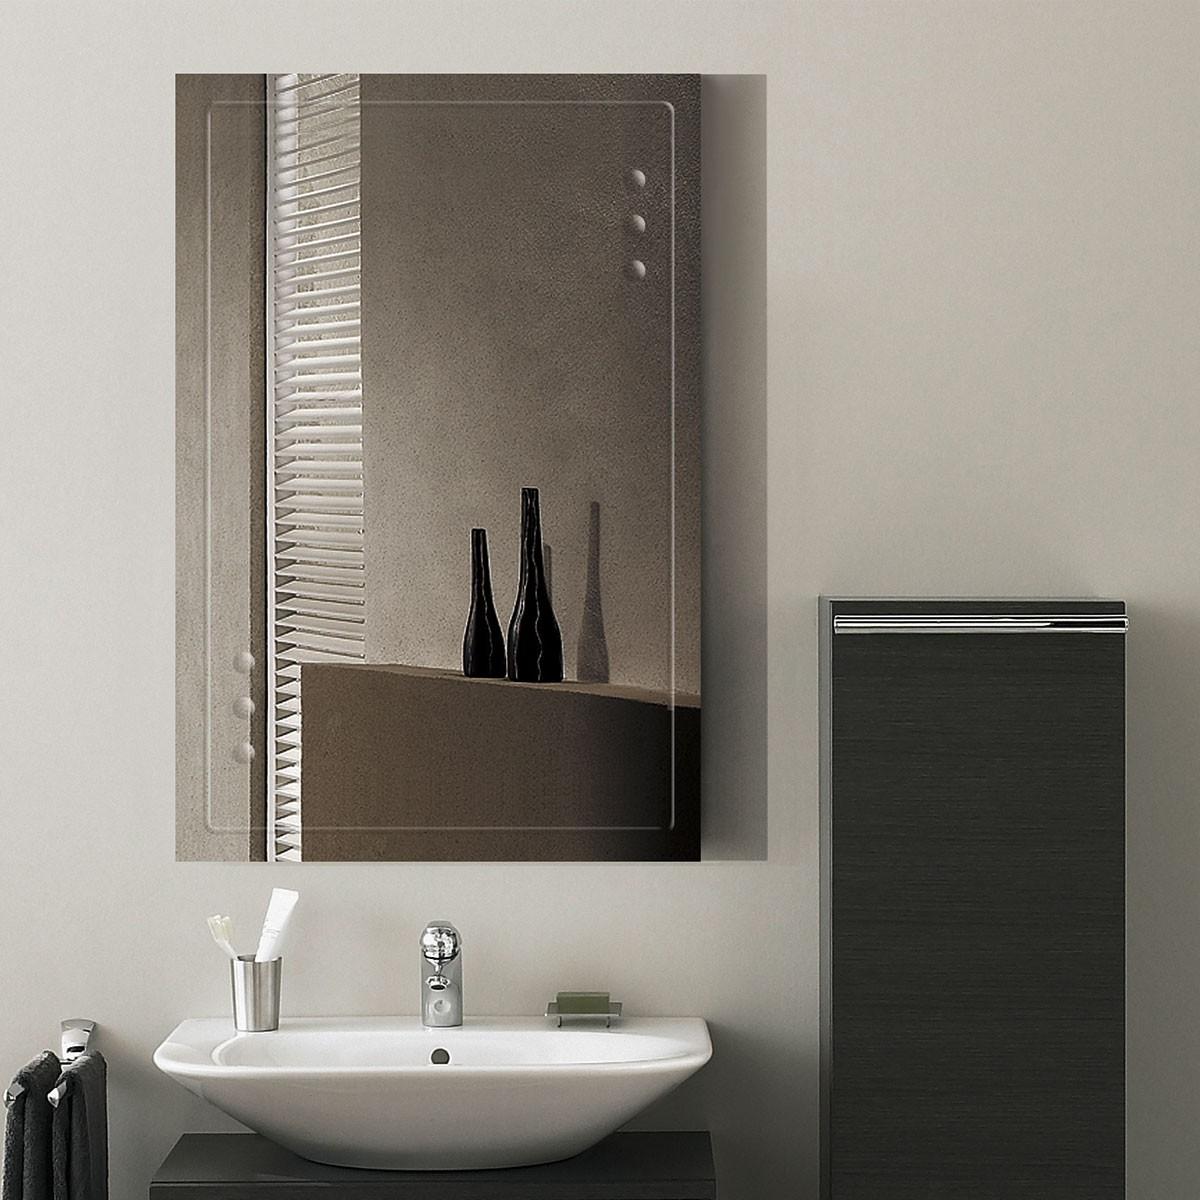 36 x 24 In. Wall-mounted Rectangle Bathroom Mirror (DK-OD-B047A)